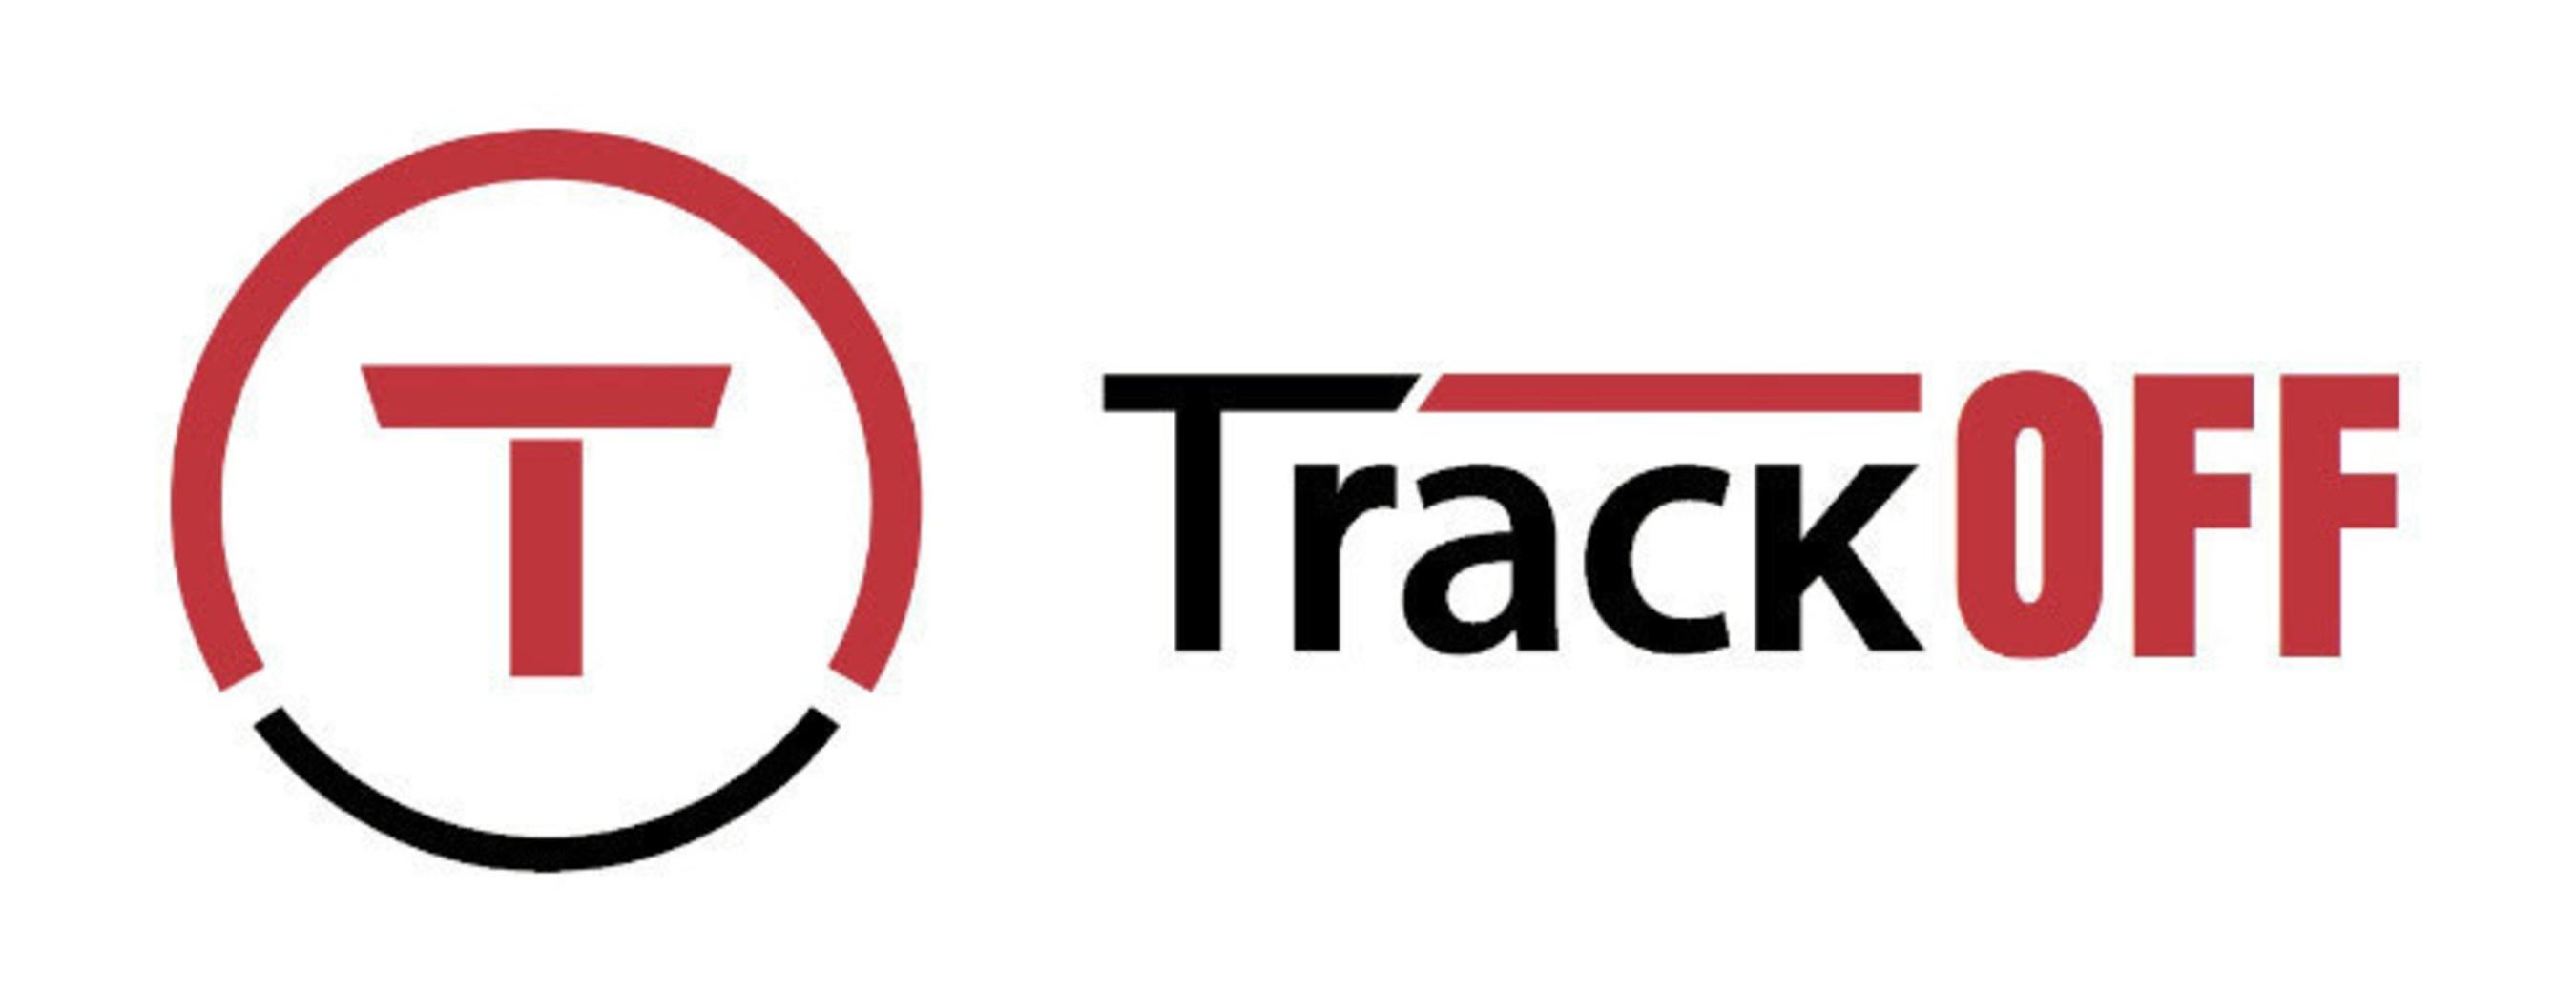 TrackOFF Logo